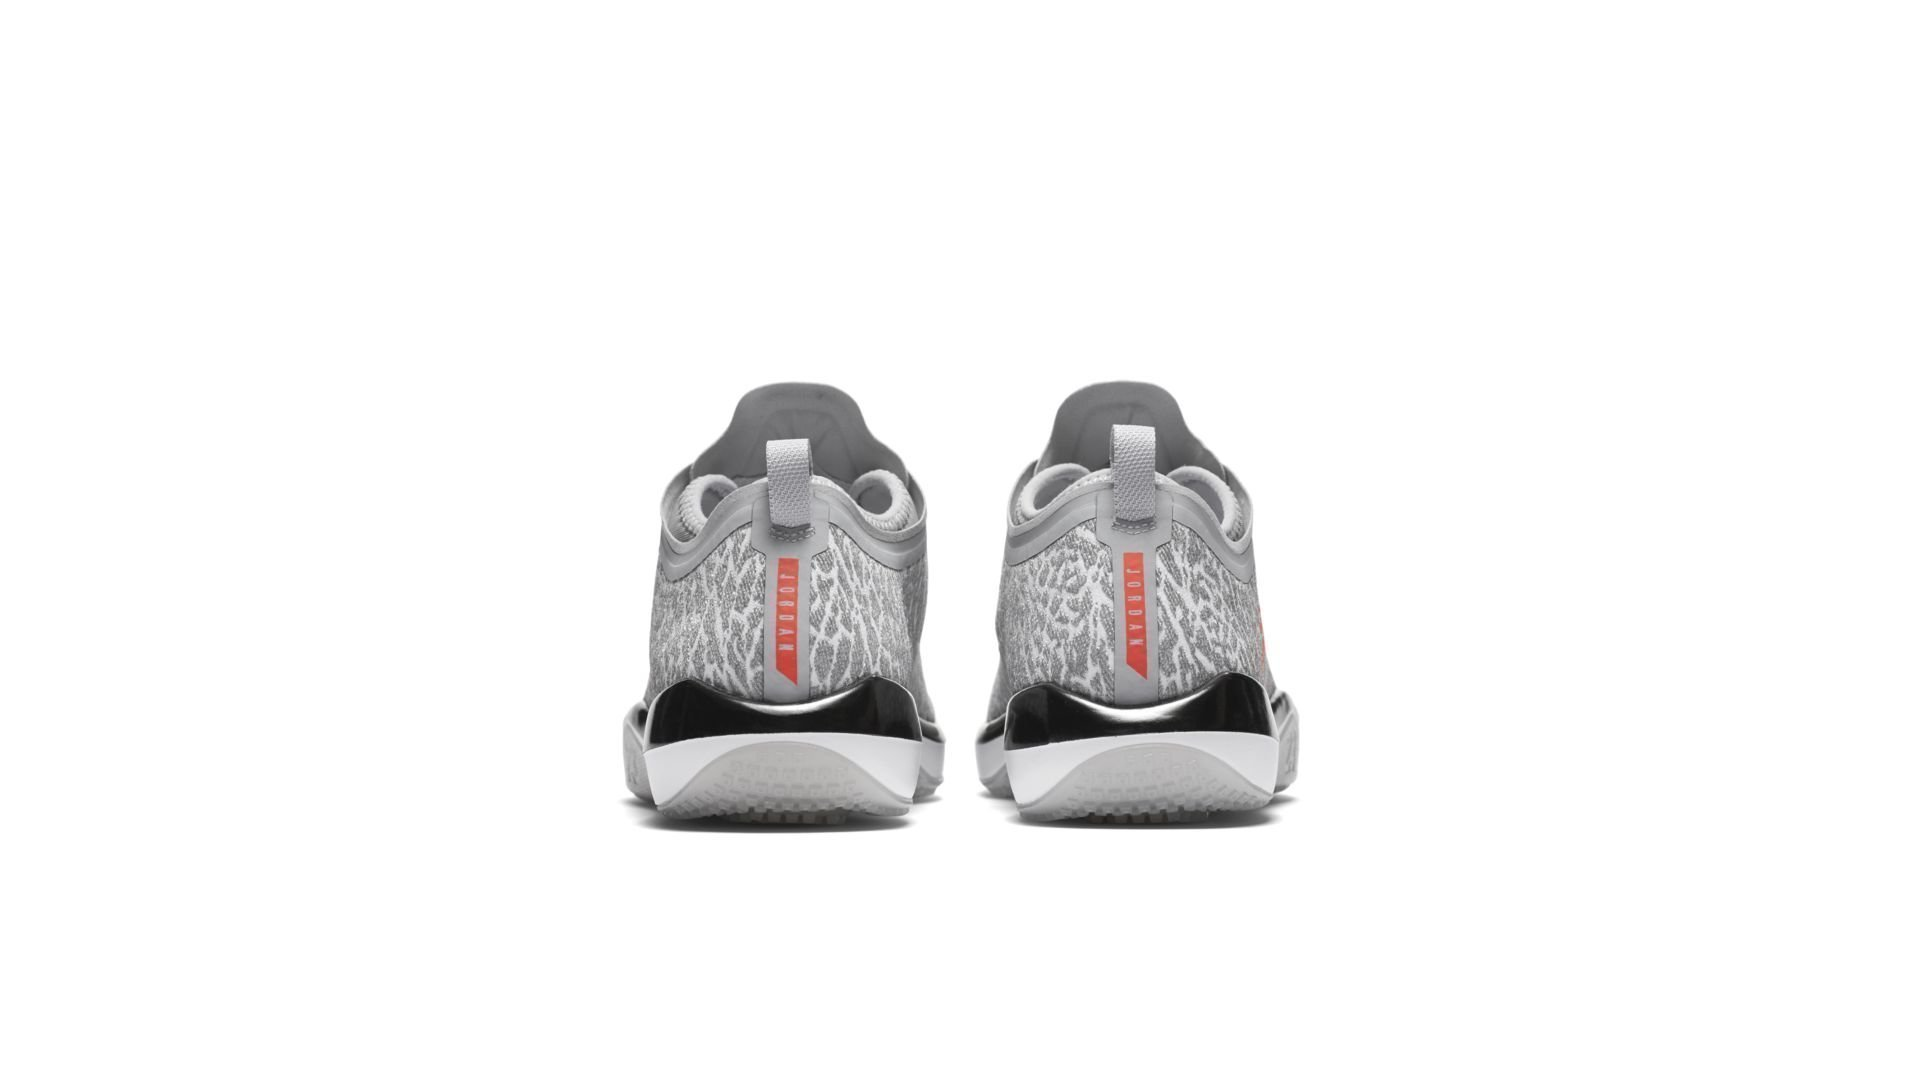 Jordan Trainer 1 Low Wolf Grey Infrared 23 (845403-103)